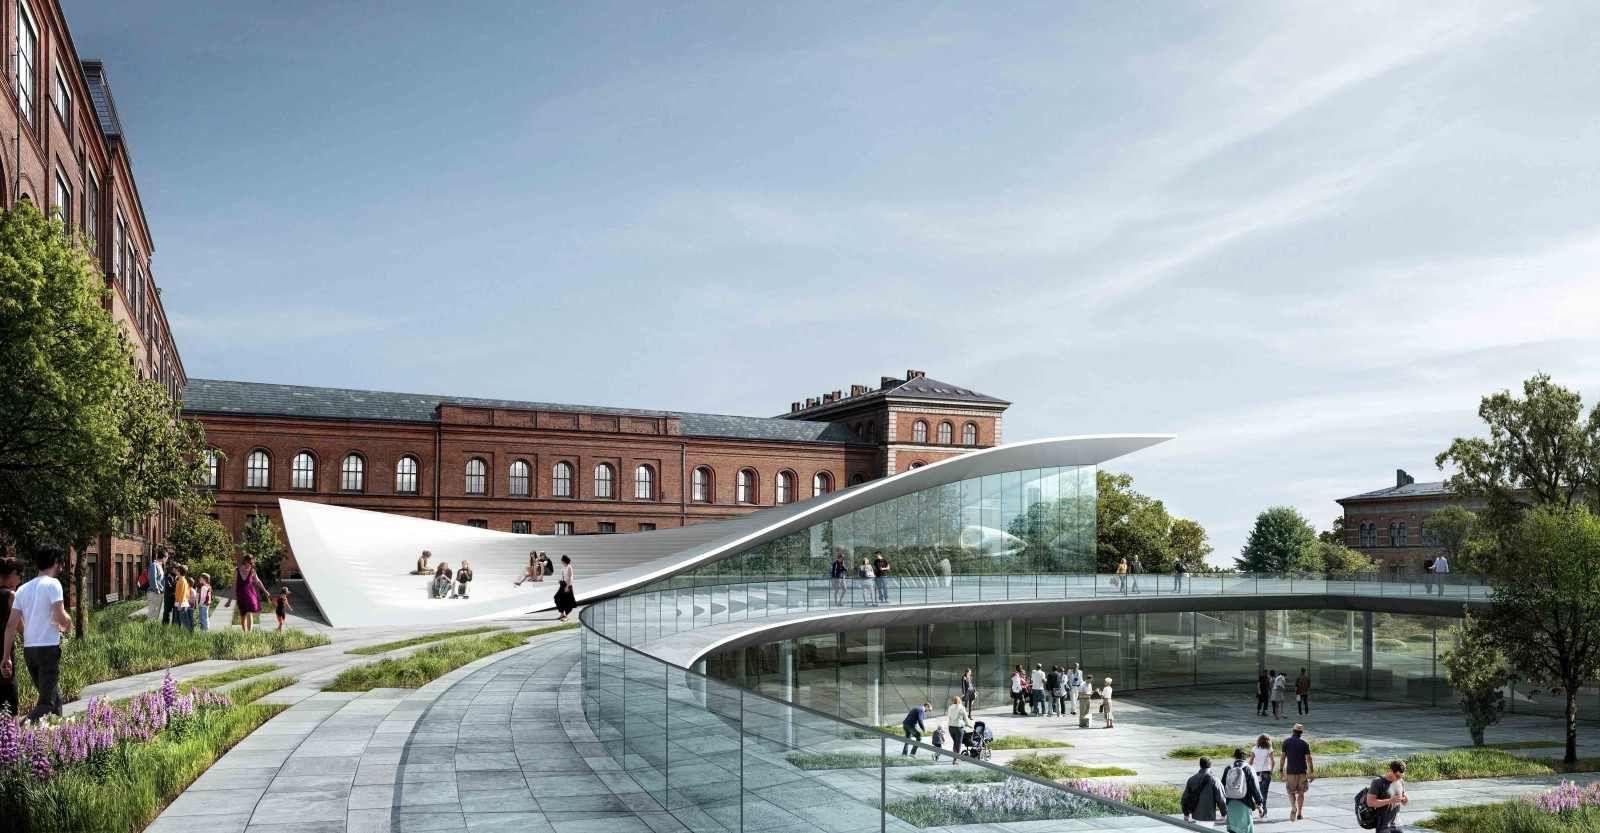 New Wing, National History Museum | Kengo Kuma, Erik Møller Arkitekter, JAJA architects http://www.arch2o.com/new-wing-national-history-museum-kengo-kuma-erik-moller-arkitekter-jaja-architects/